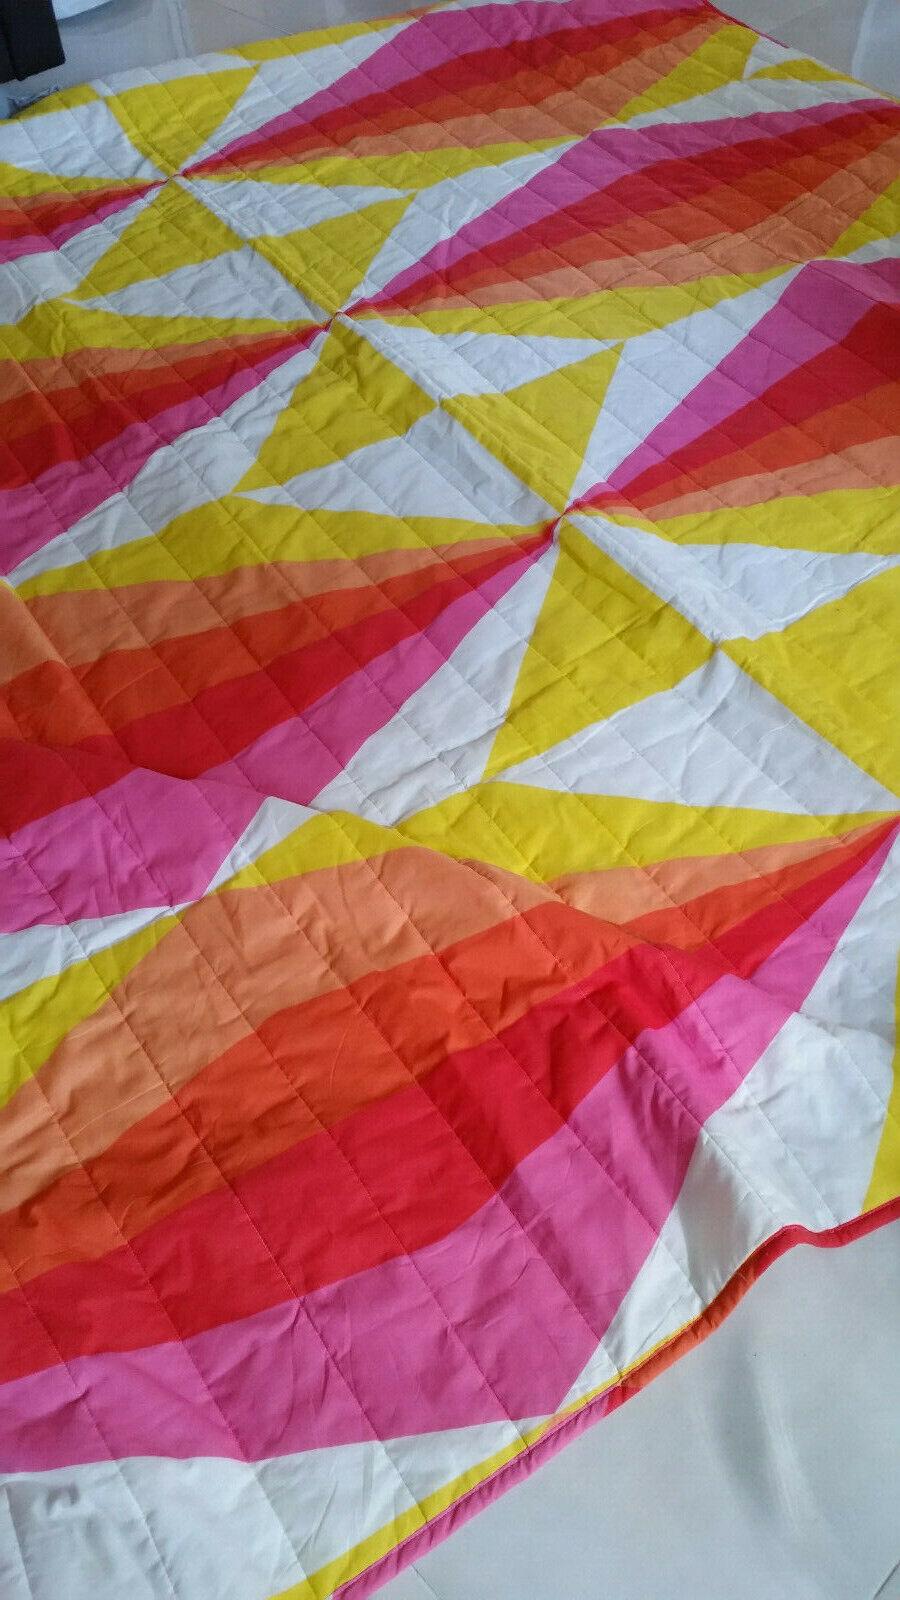 Ikea King Größe Bed Cover Bedspread 110 102rot Orange Gelb X